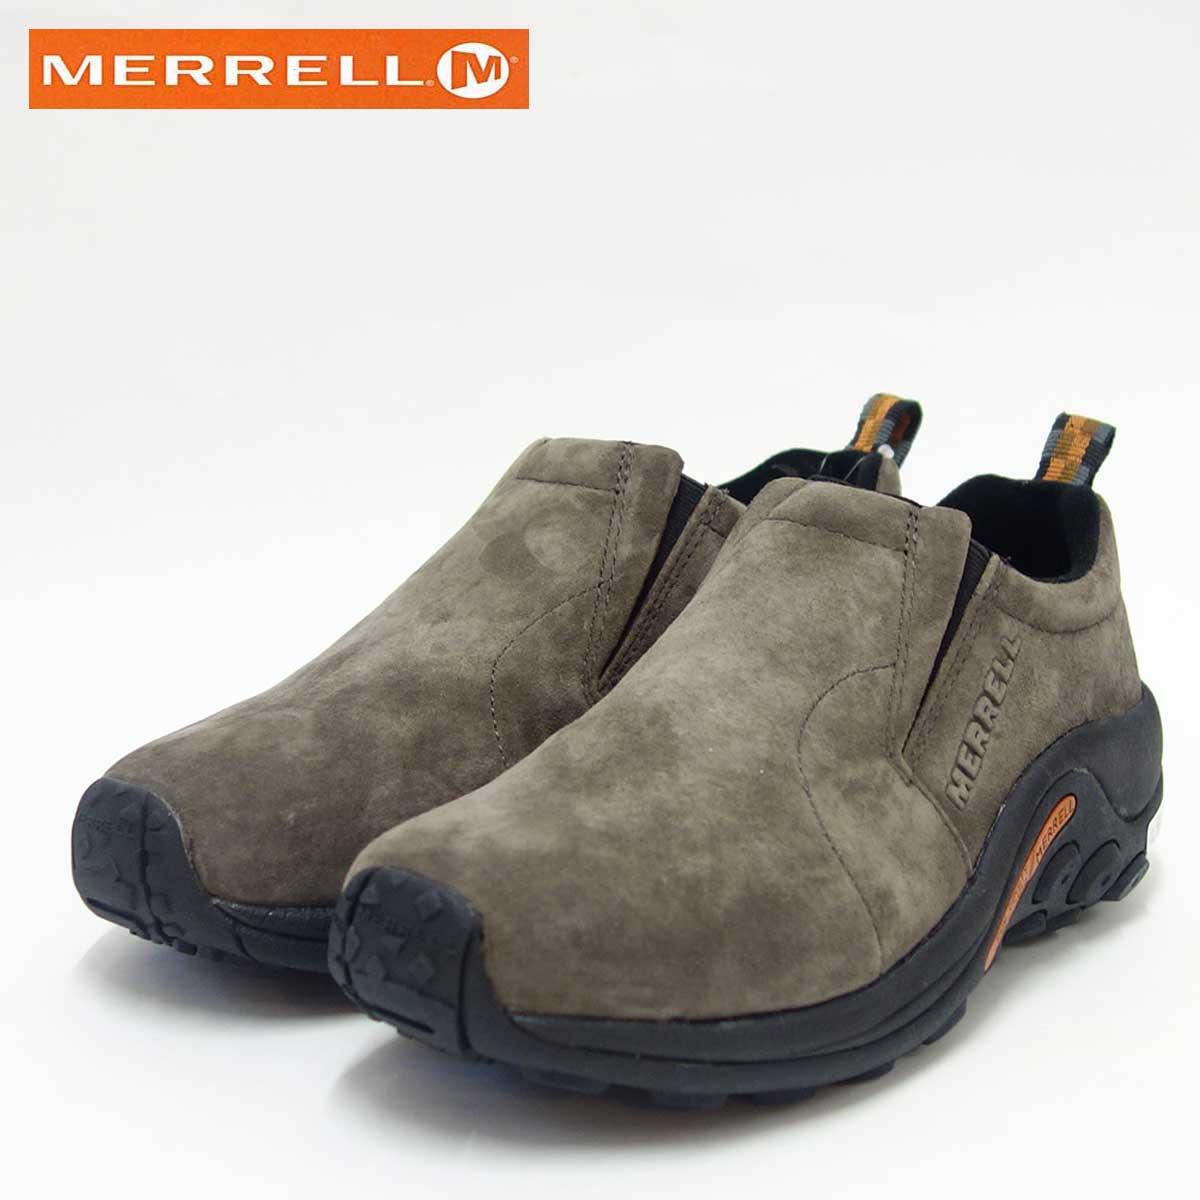 MERRELL メレル ジャングルモックJungle MocGunsmoke(メンズ)60787エアークッションで快適ウォーク「靴」